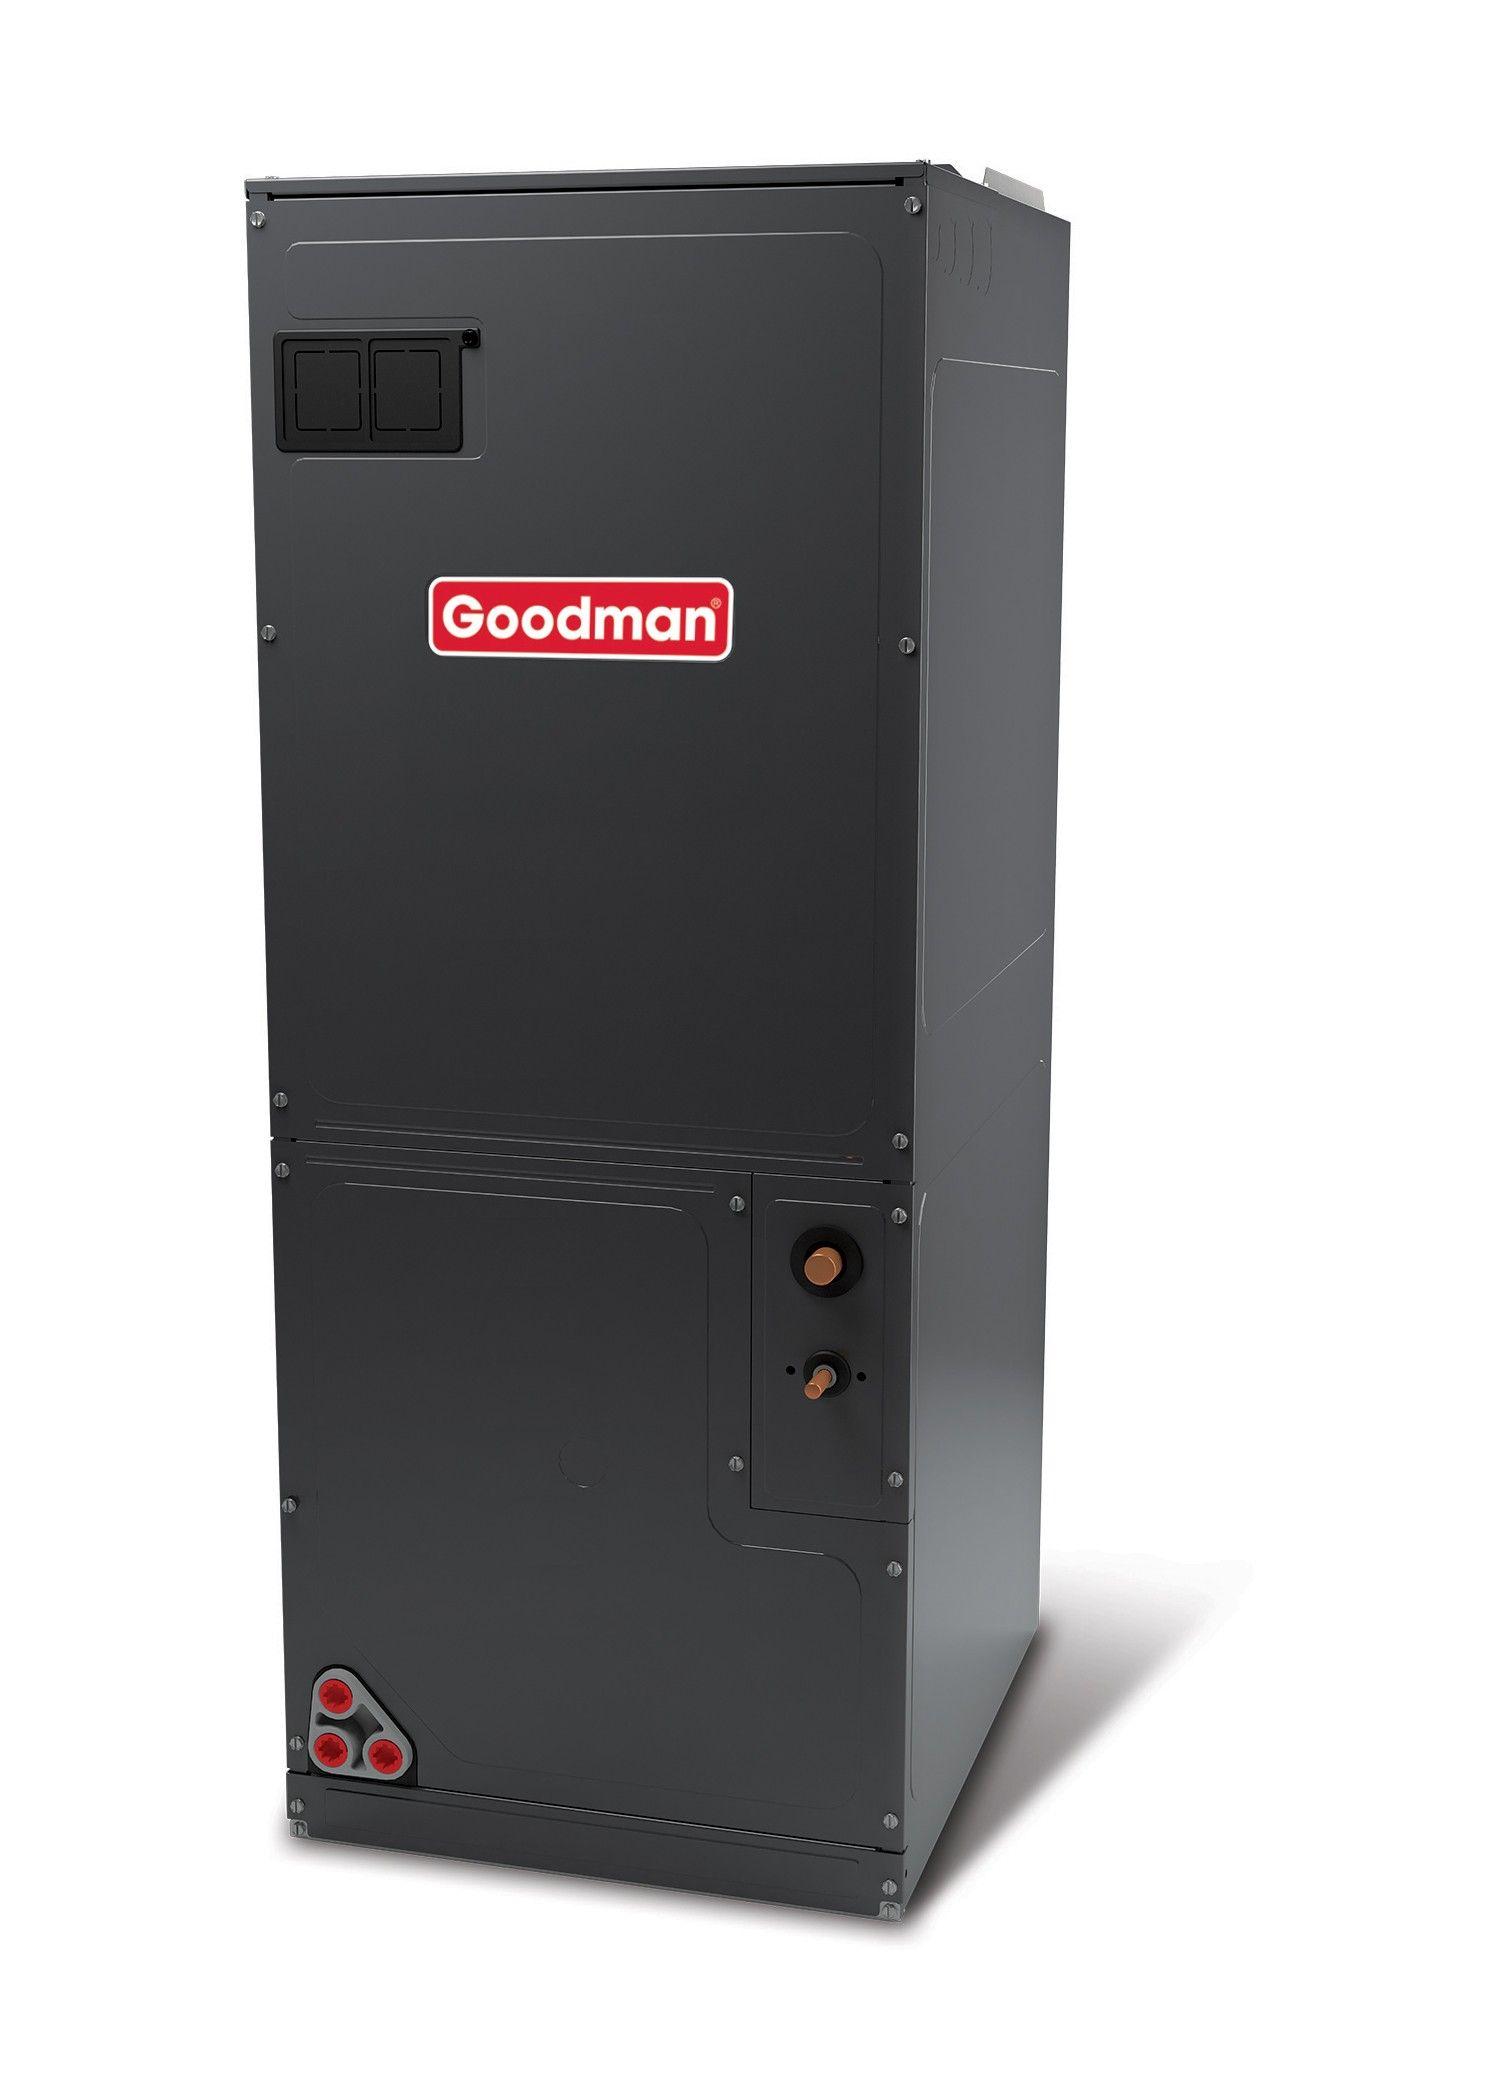 Goodman 4.0 Ton ASPT High-Efficiency Multiposition Air Handler